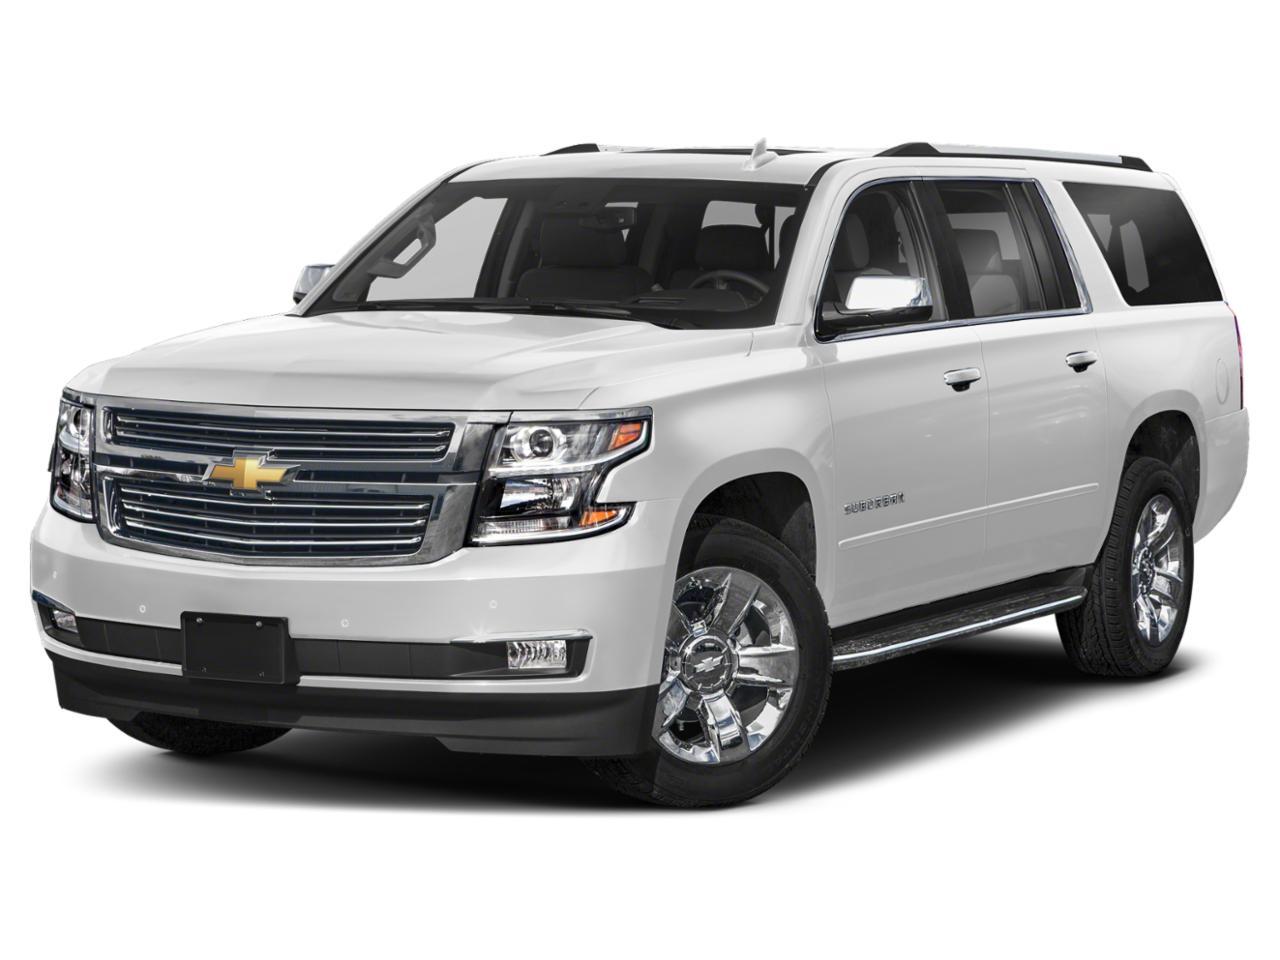 2020 Chevrolet Suburban Vehicle Photo in Saginaw, MI 48609